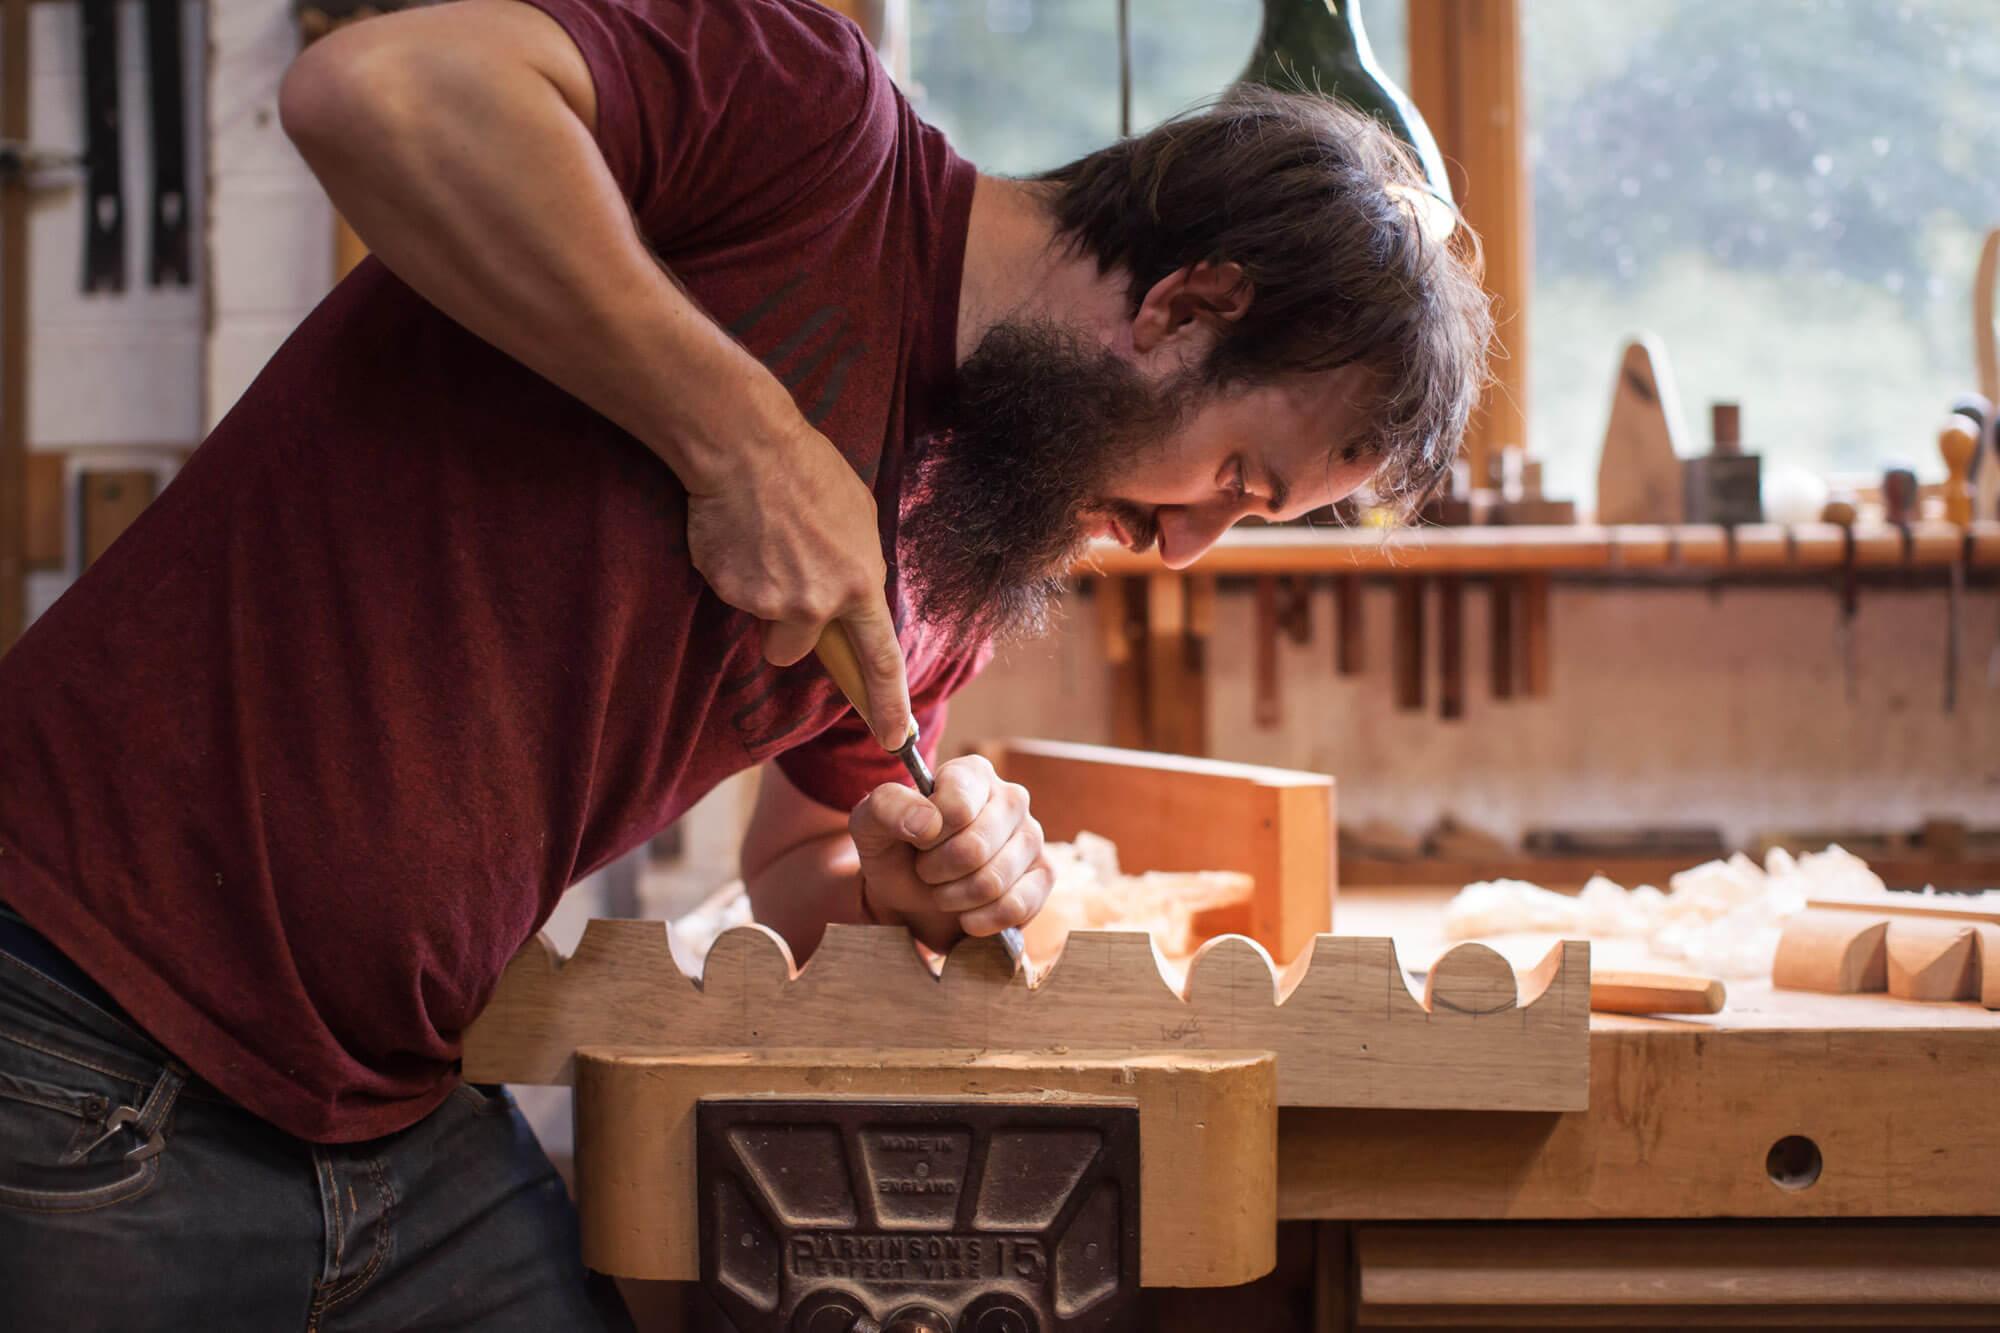 Lara Jane thorpe - commercial photography dorset -woodcarving